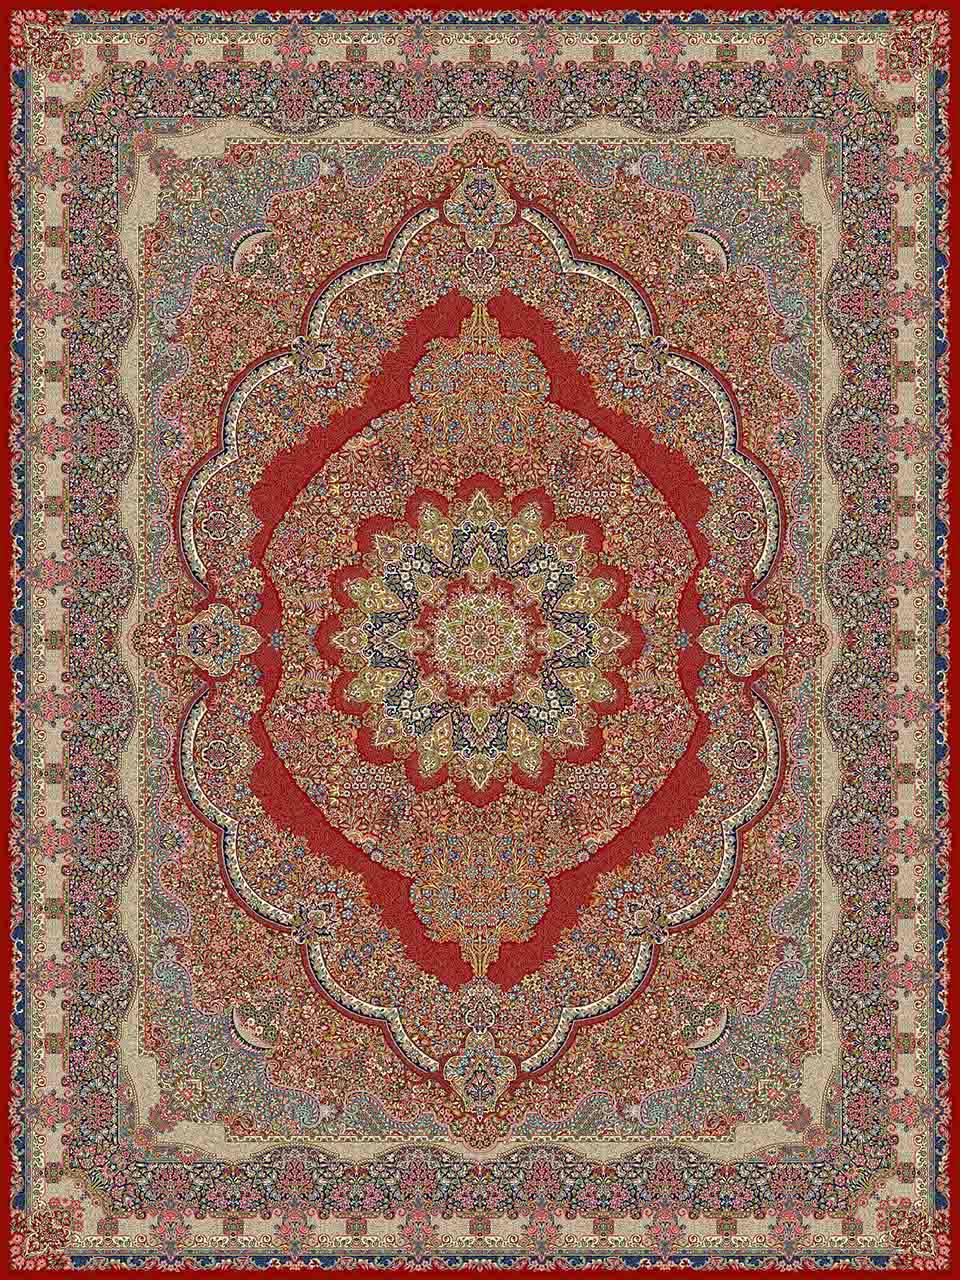 فرش (25004) اکریلیک - 8 رنگ - 700 شانه - لاكي - تراکم 2550